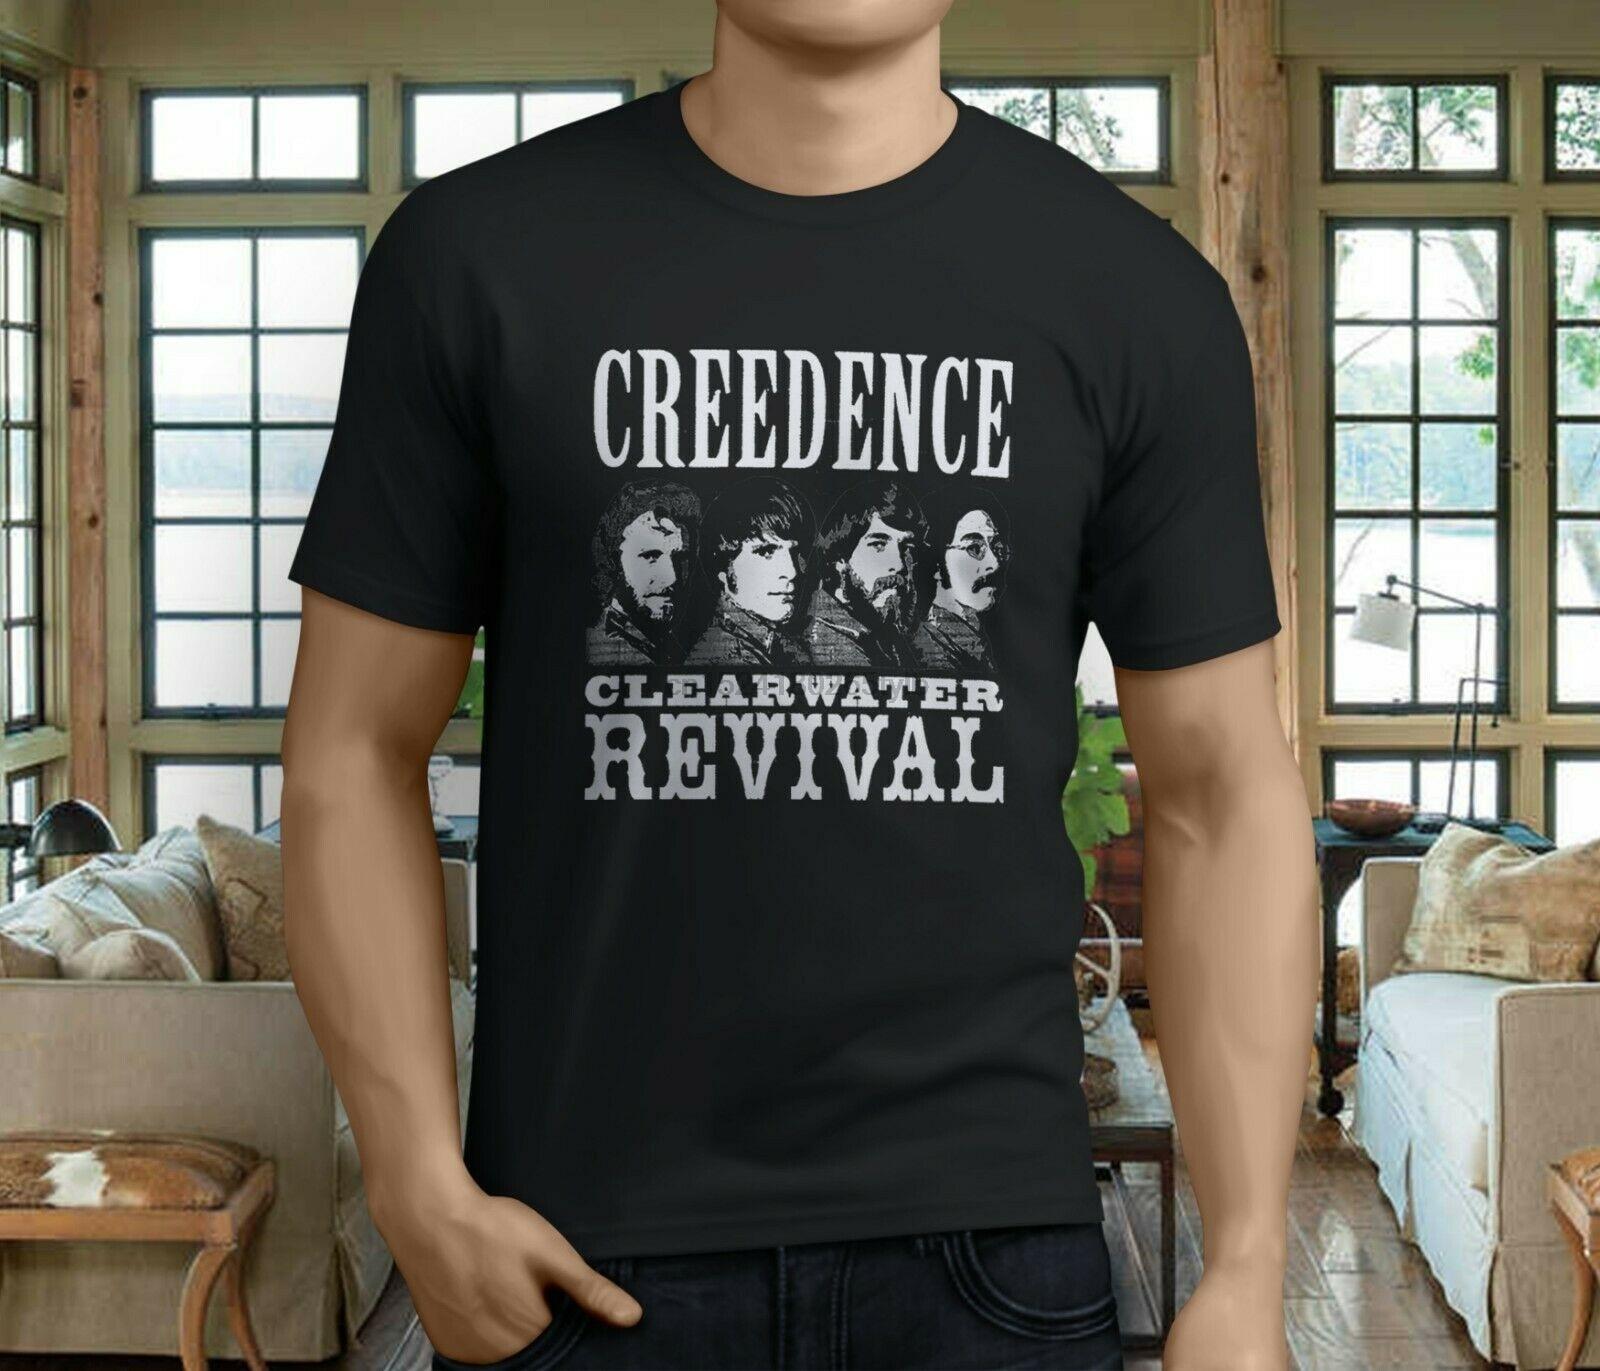 Novo popular creedence clearwater revival 70s rock band masculino preto camiseta S-3XL